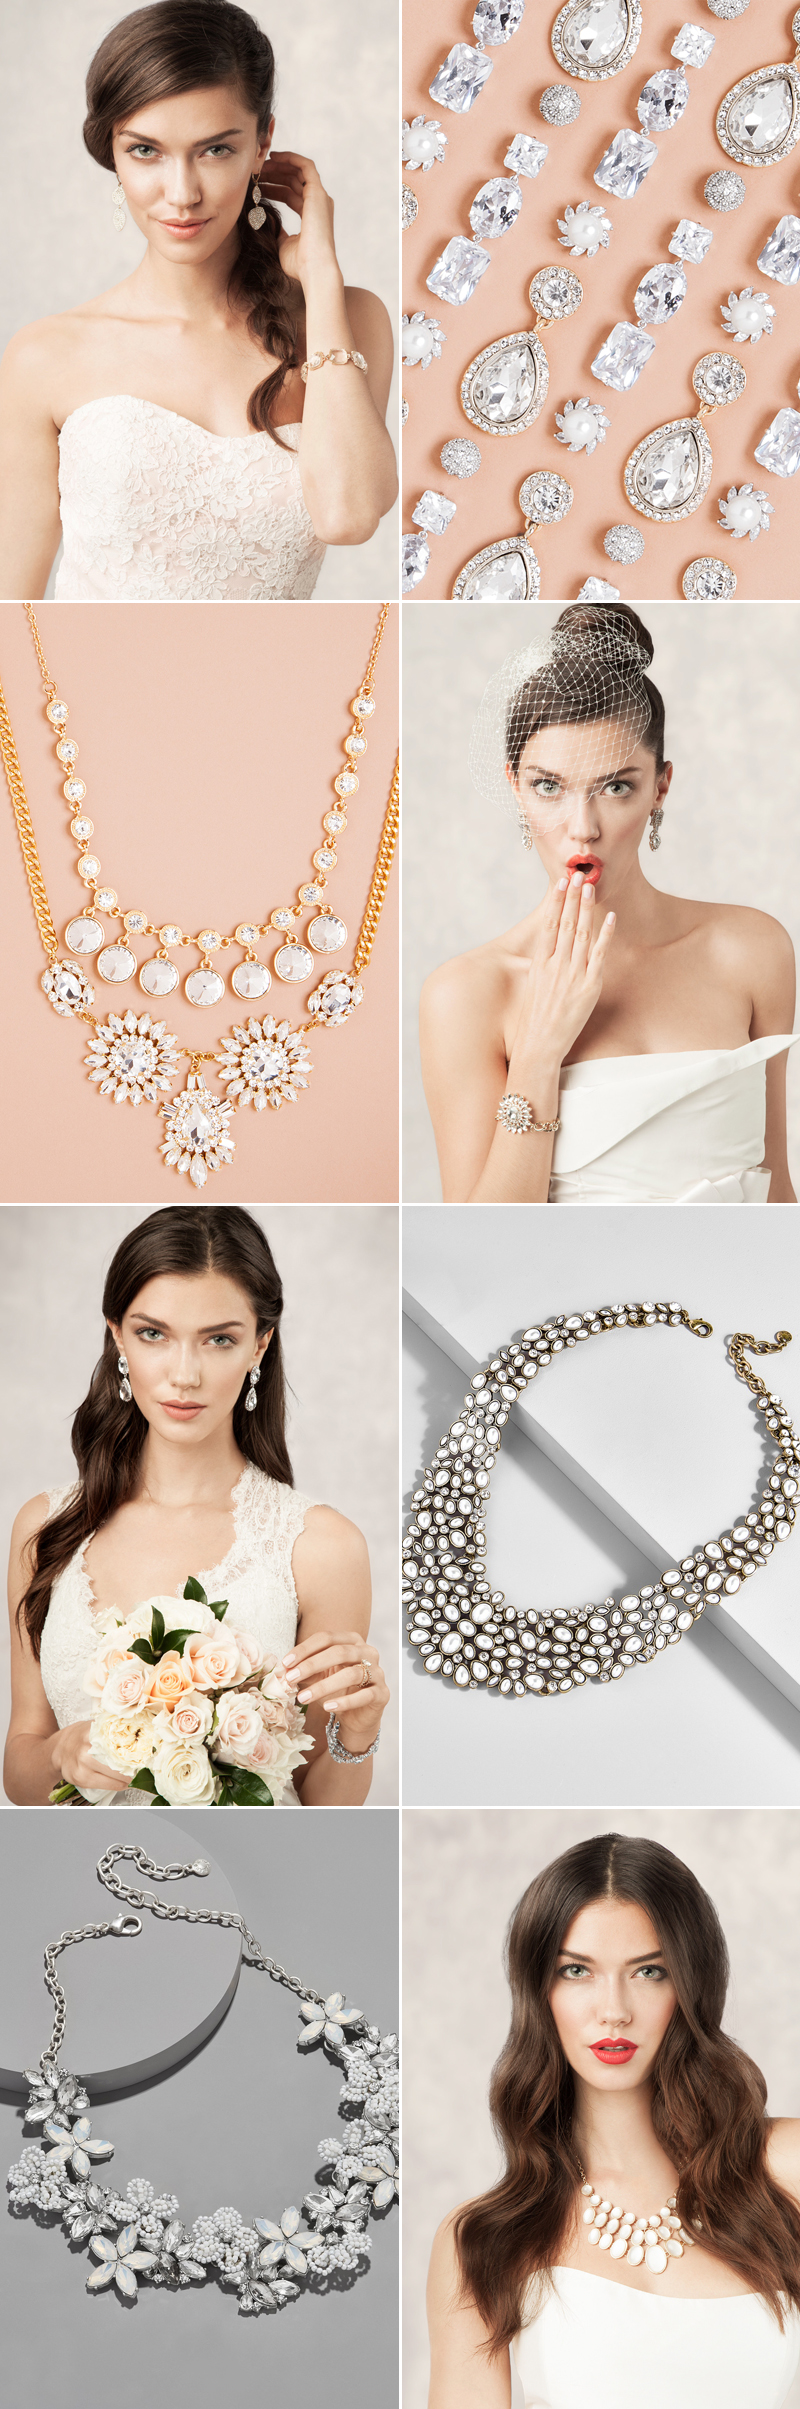 bridaljewelry04-Baublebar